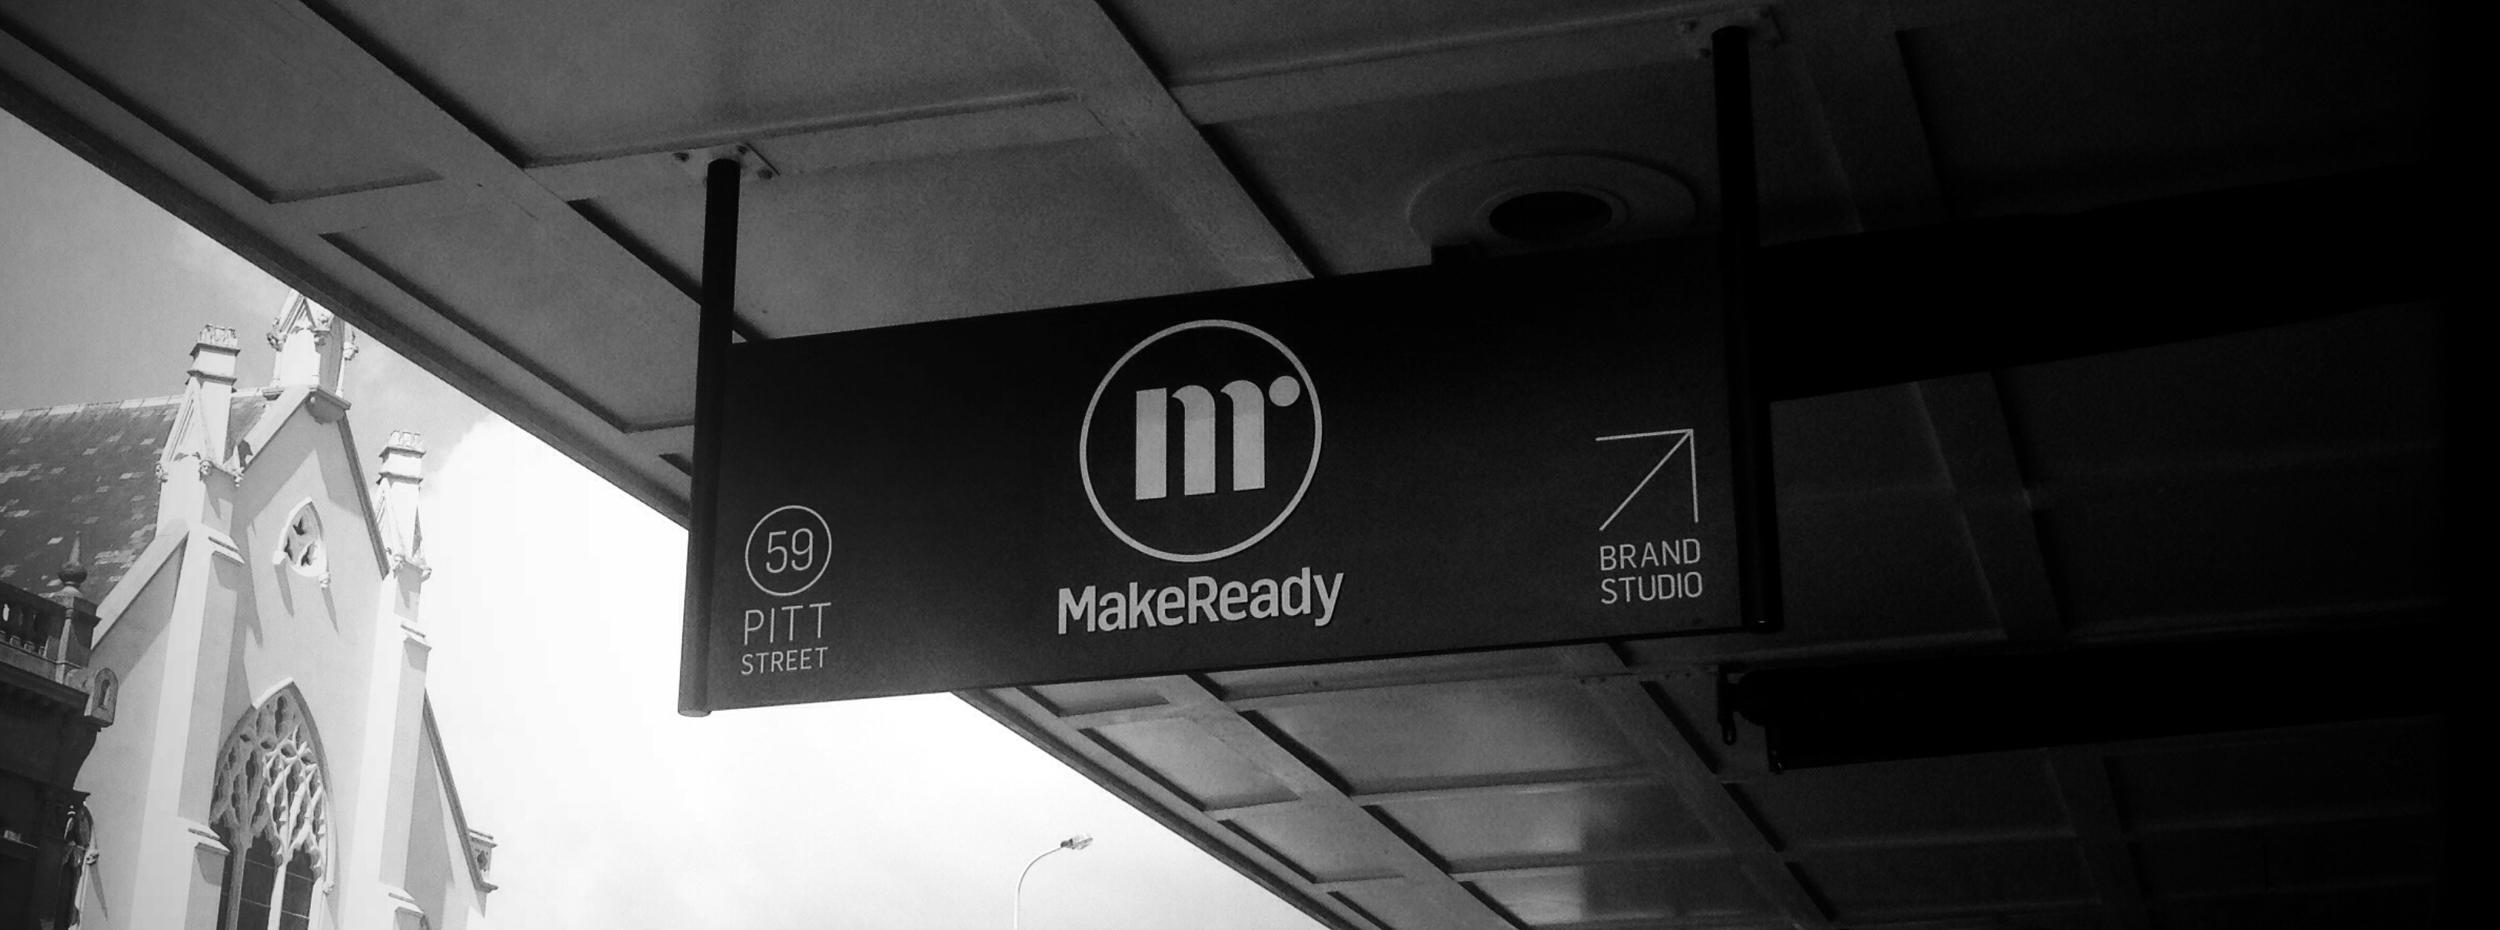 MakeReady HQ